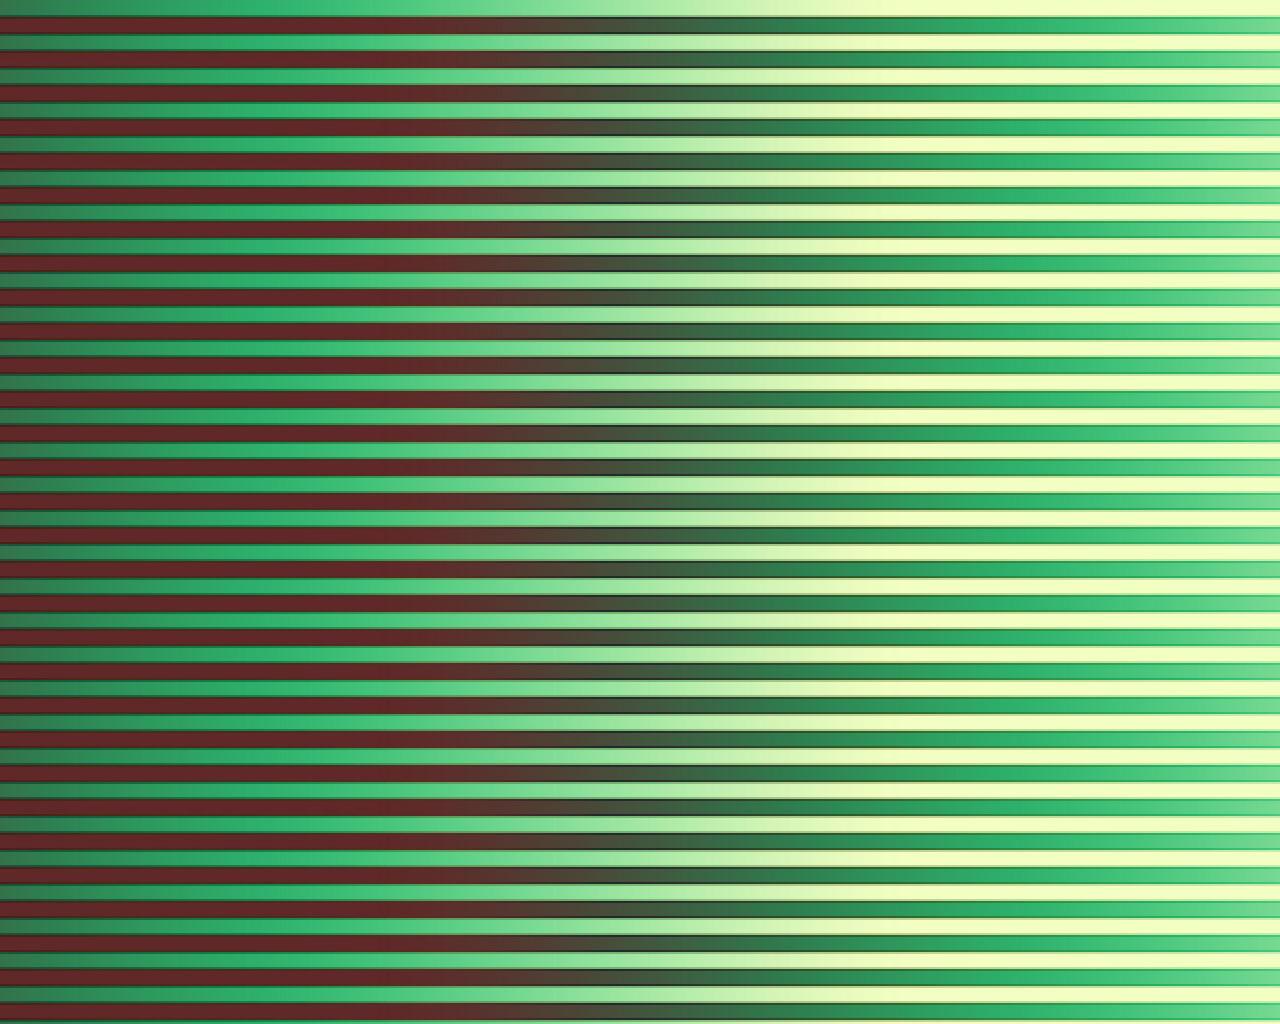 Pastel Green Horizontal Stripes Iphone